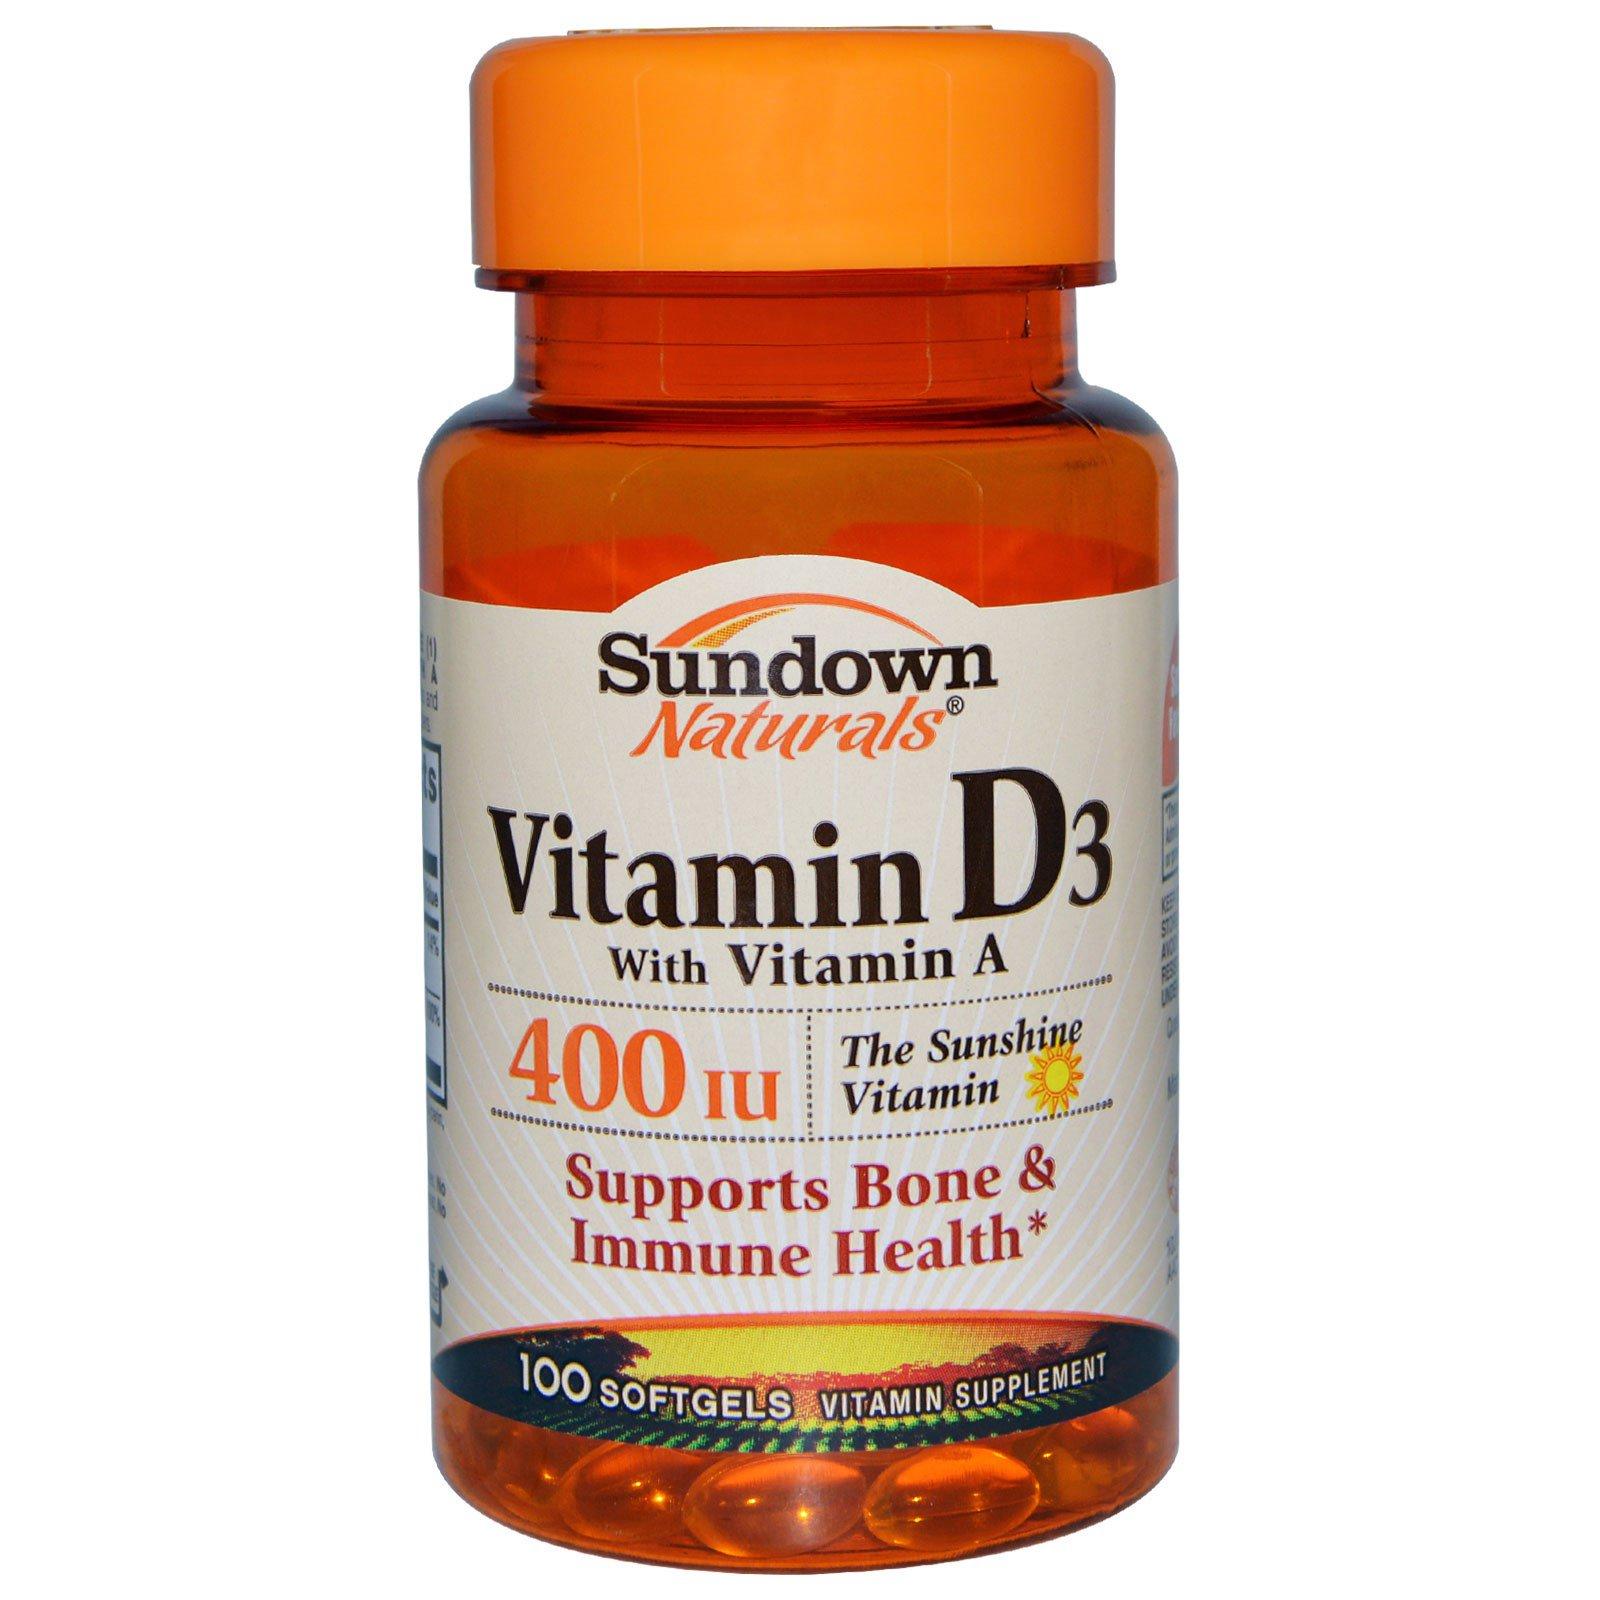 Sundown vitamins